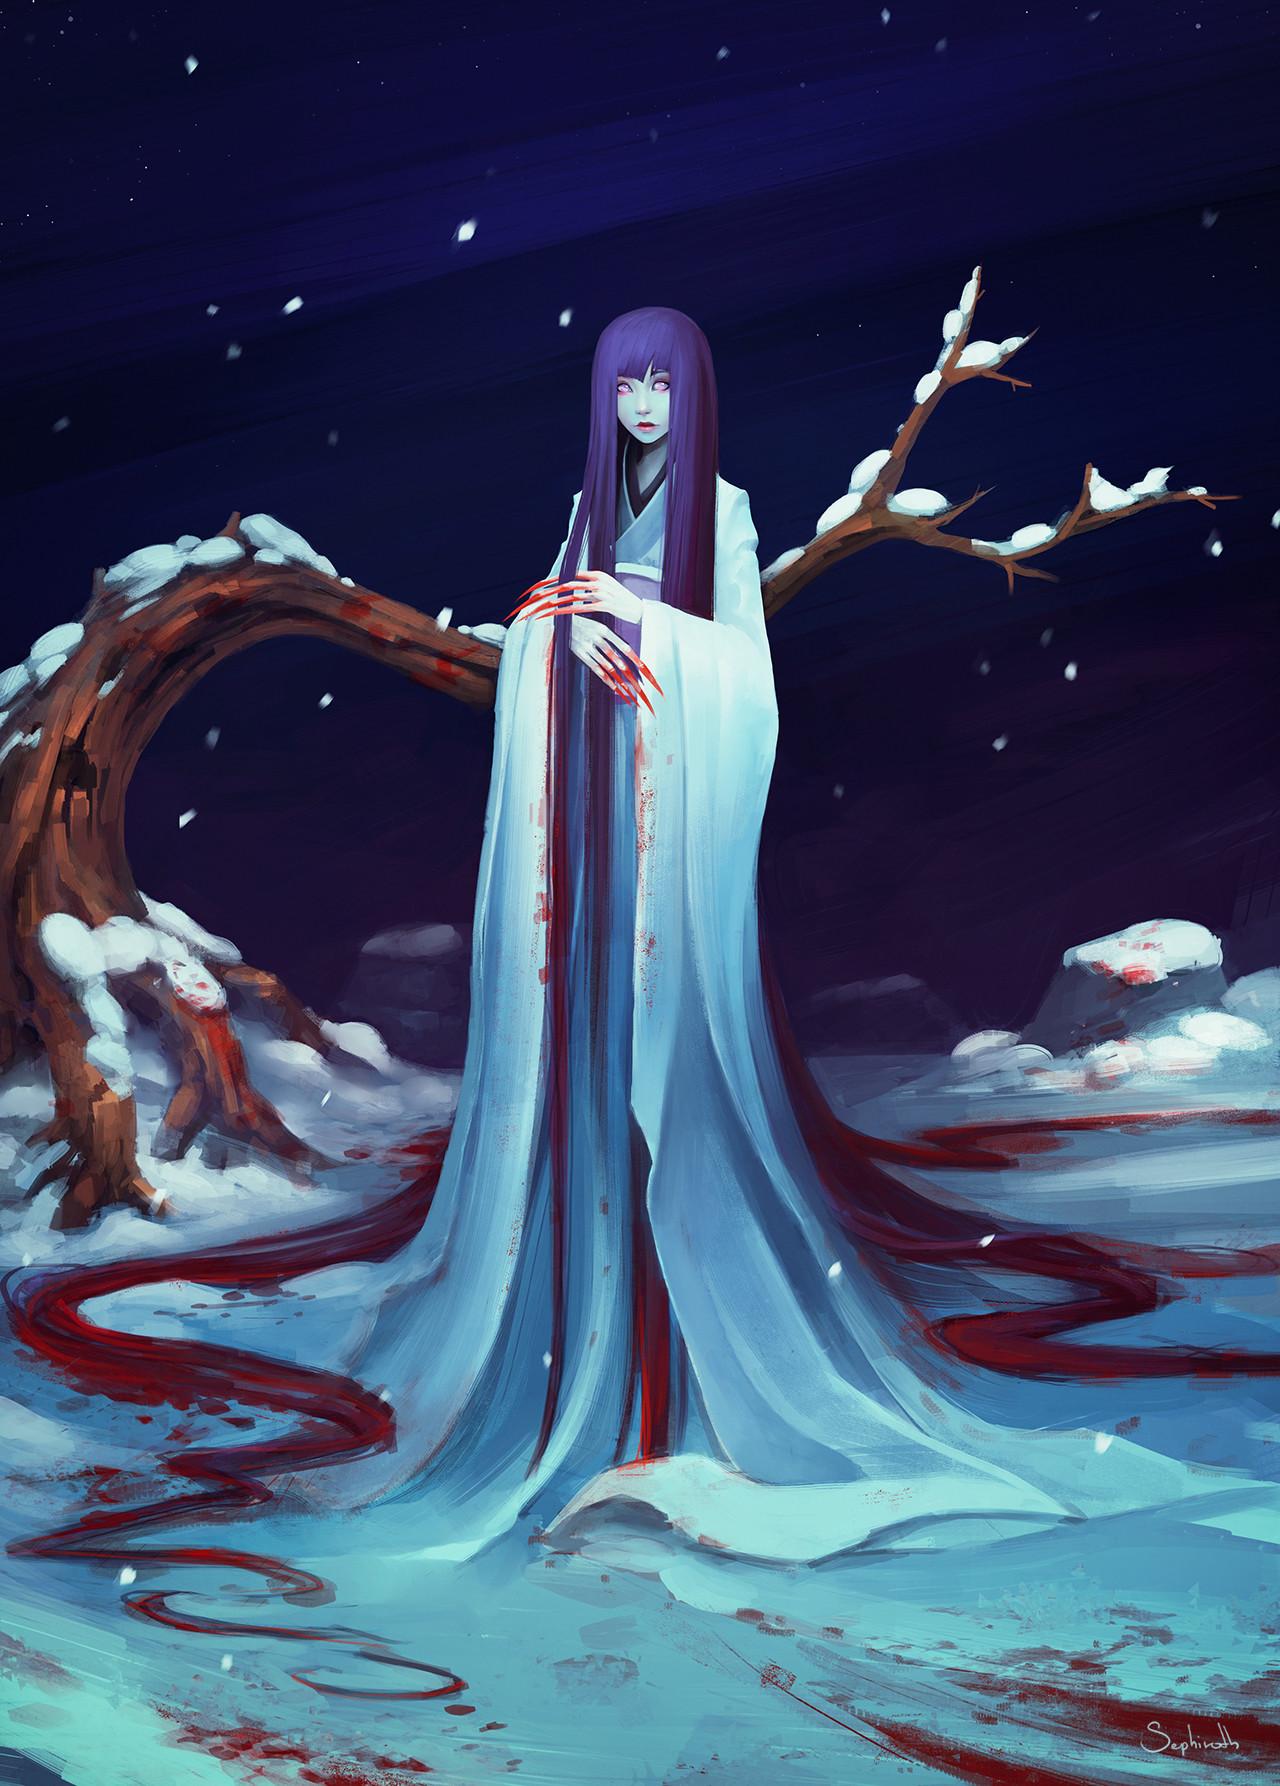 https://cdna.artstation.com/p/assets/images/images/012/878/680/large/sephiroth-art-yuki-onna.jpg?1536961195